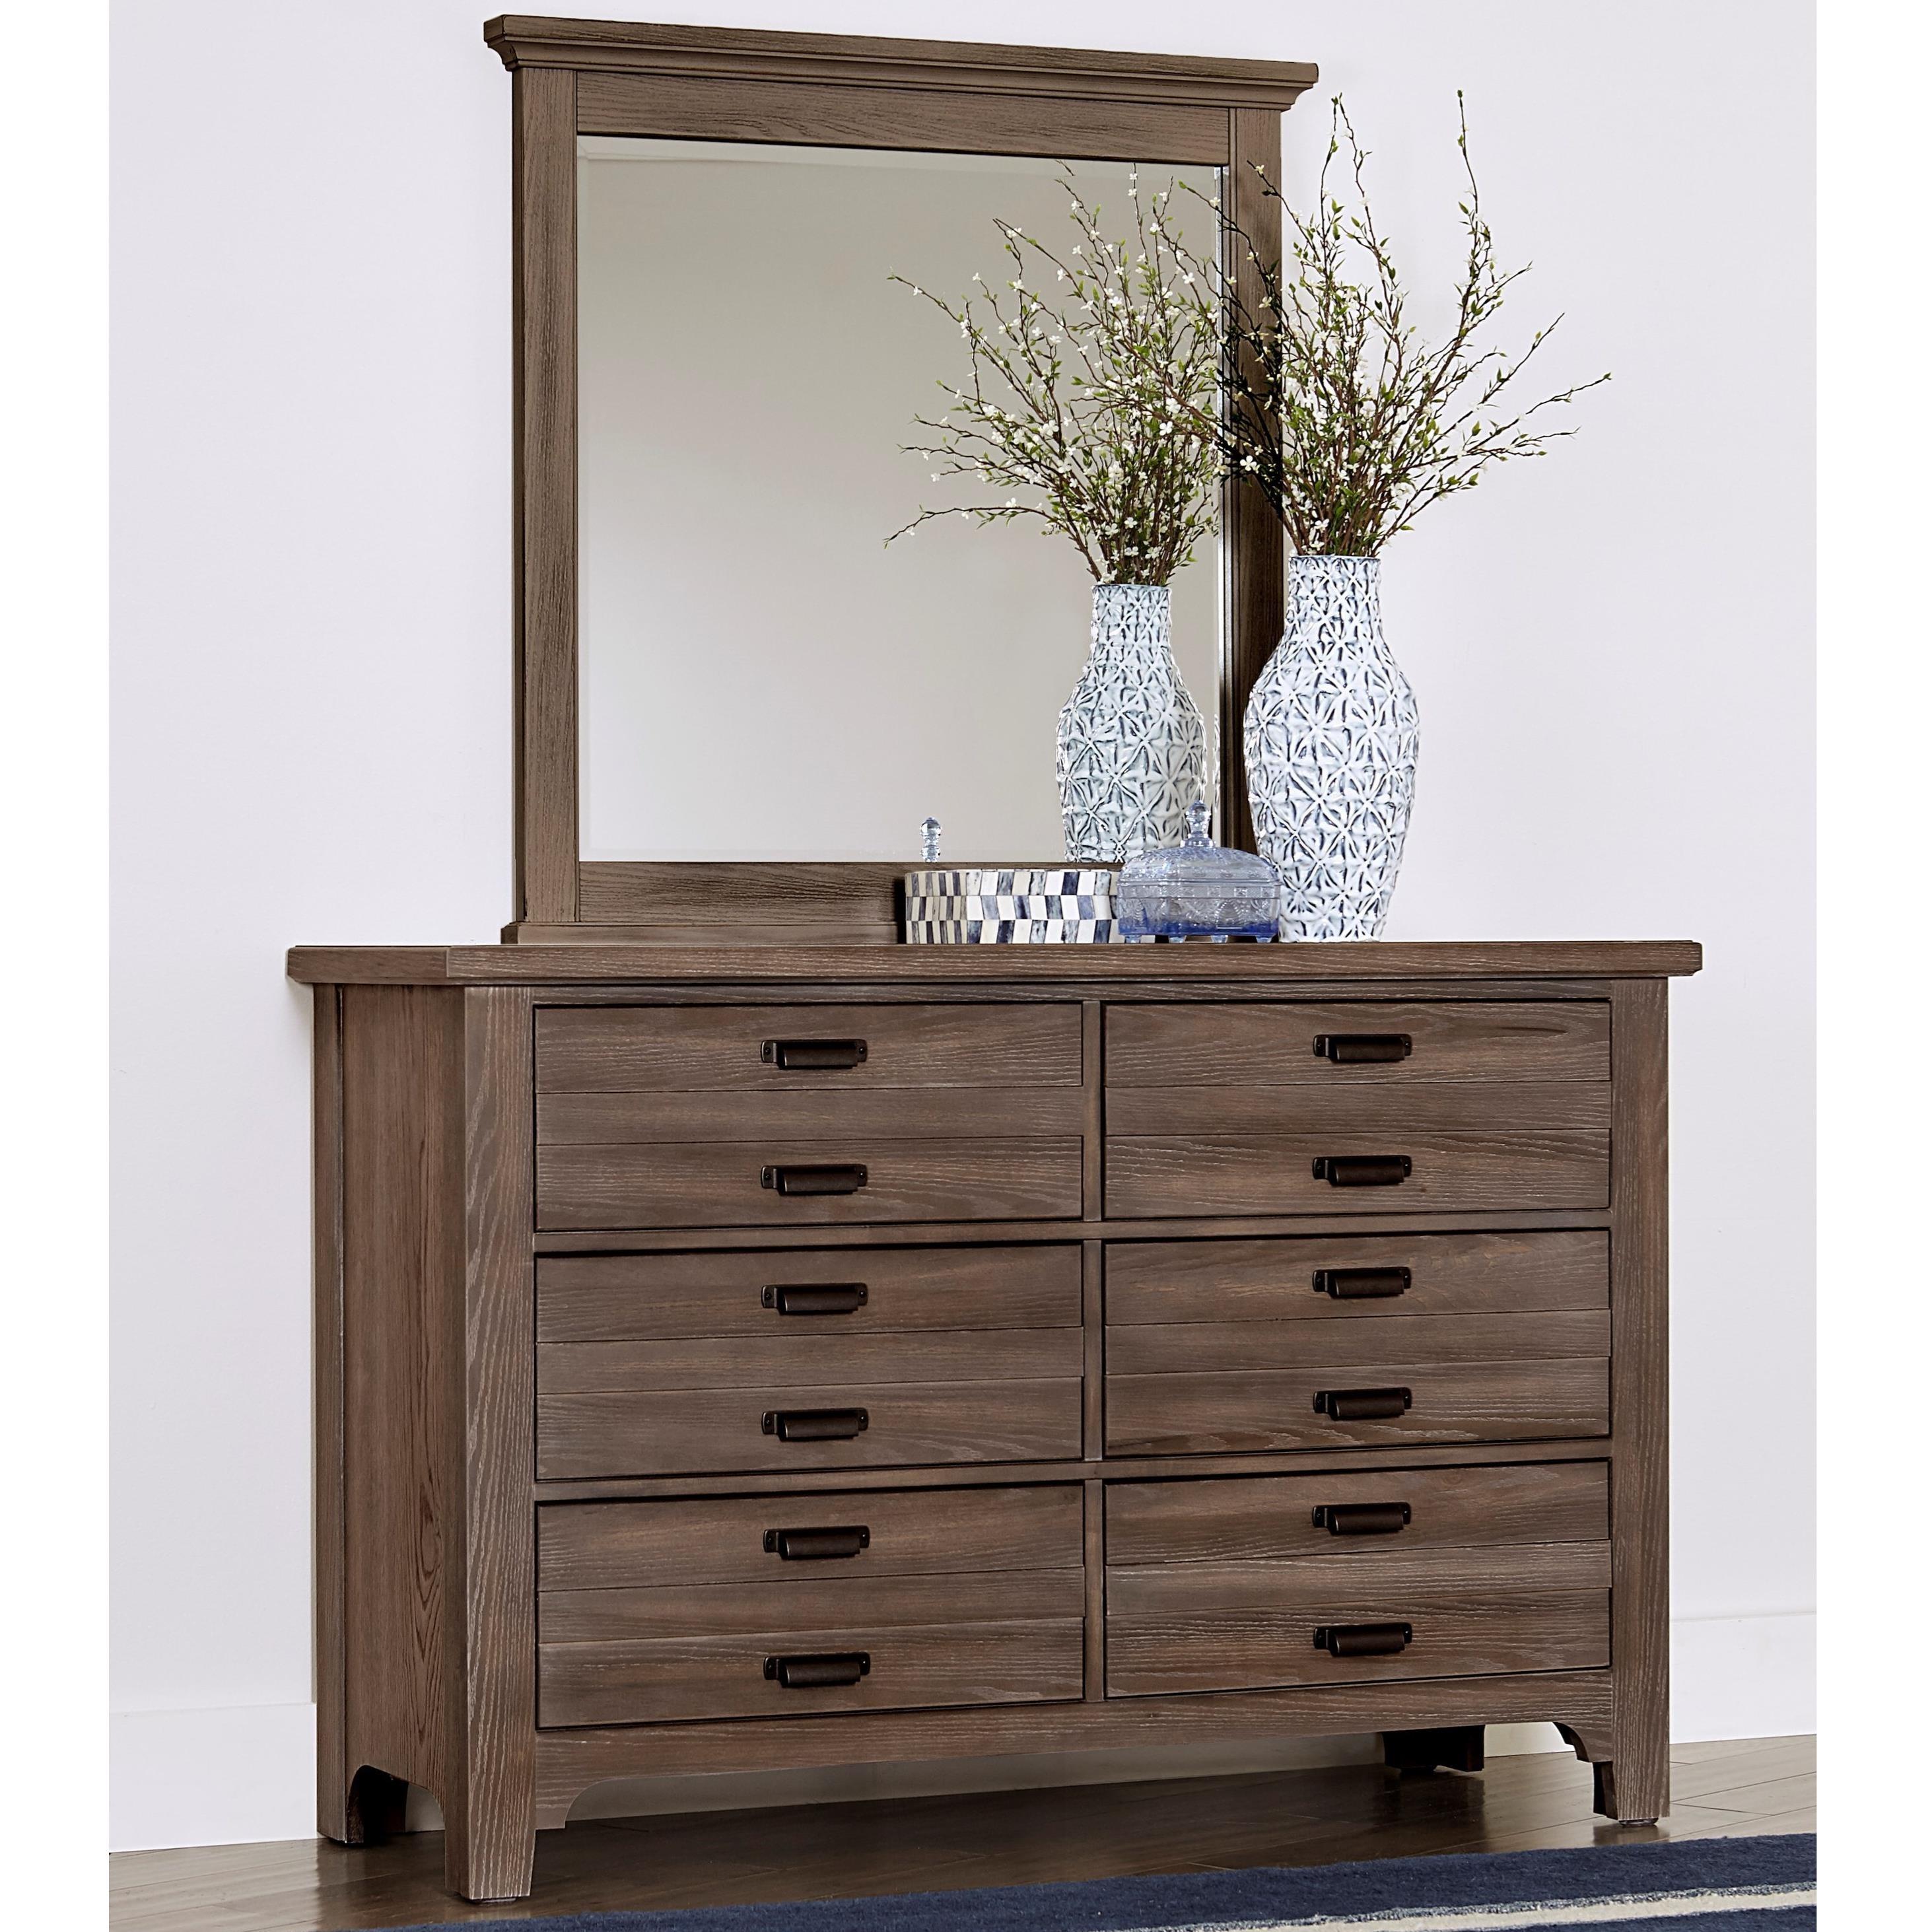 Double Dresser and Landscape Mirror